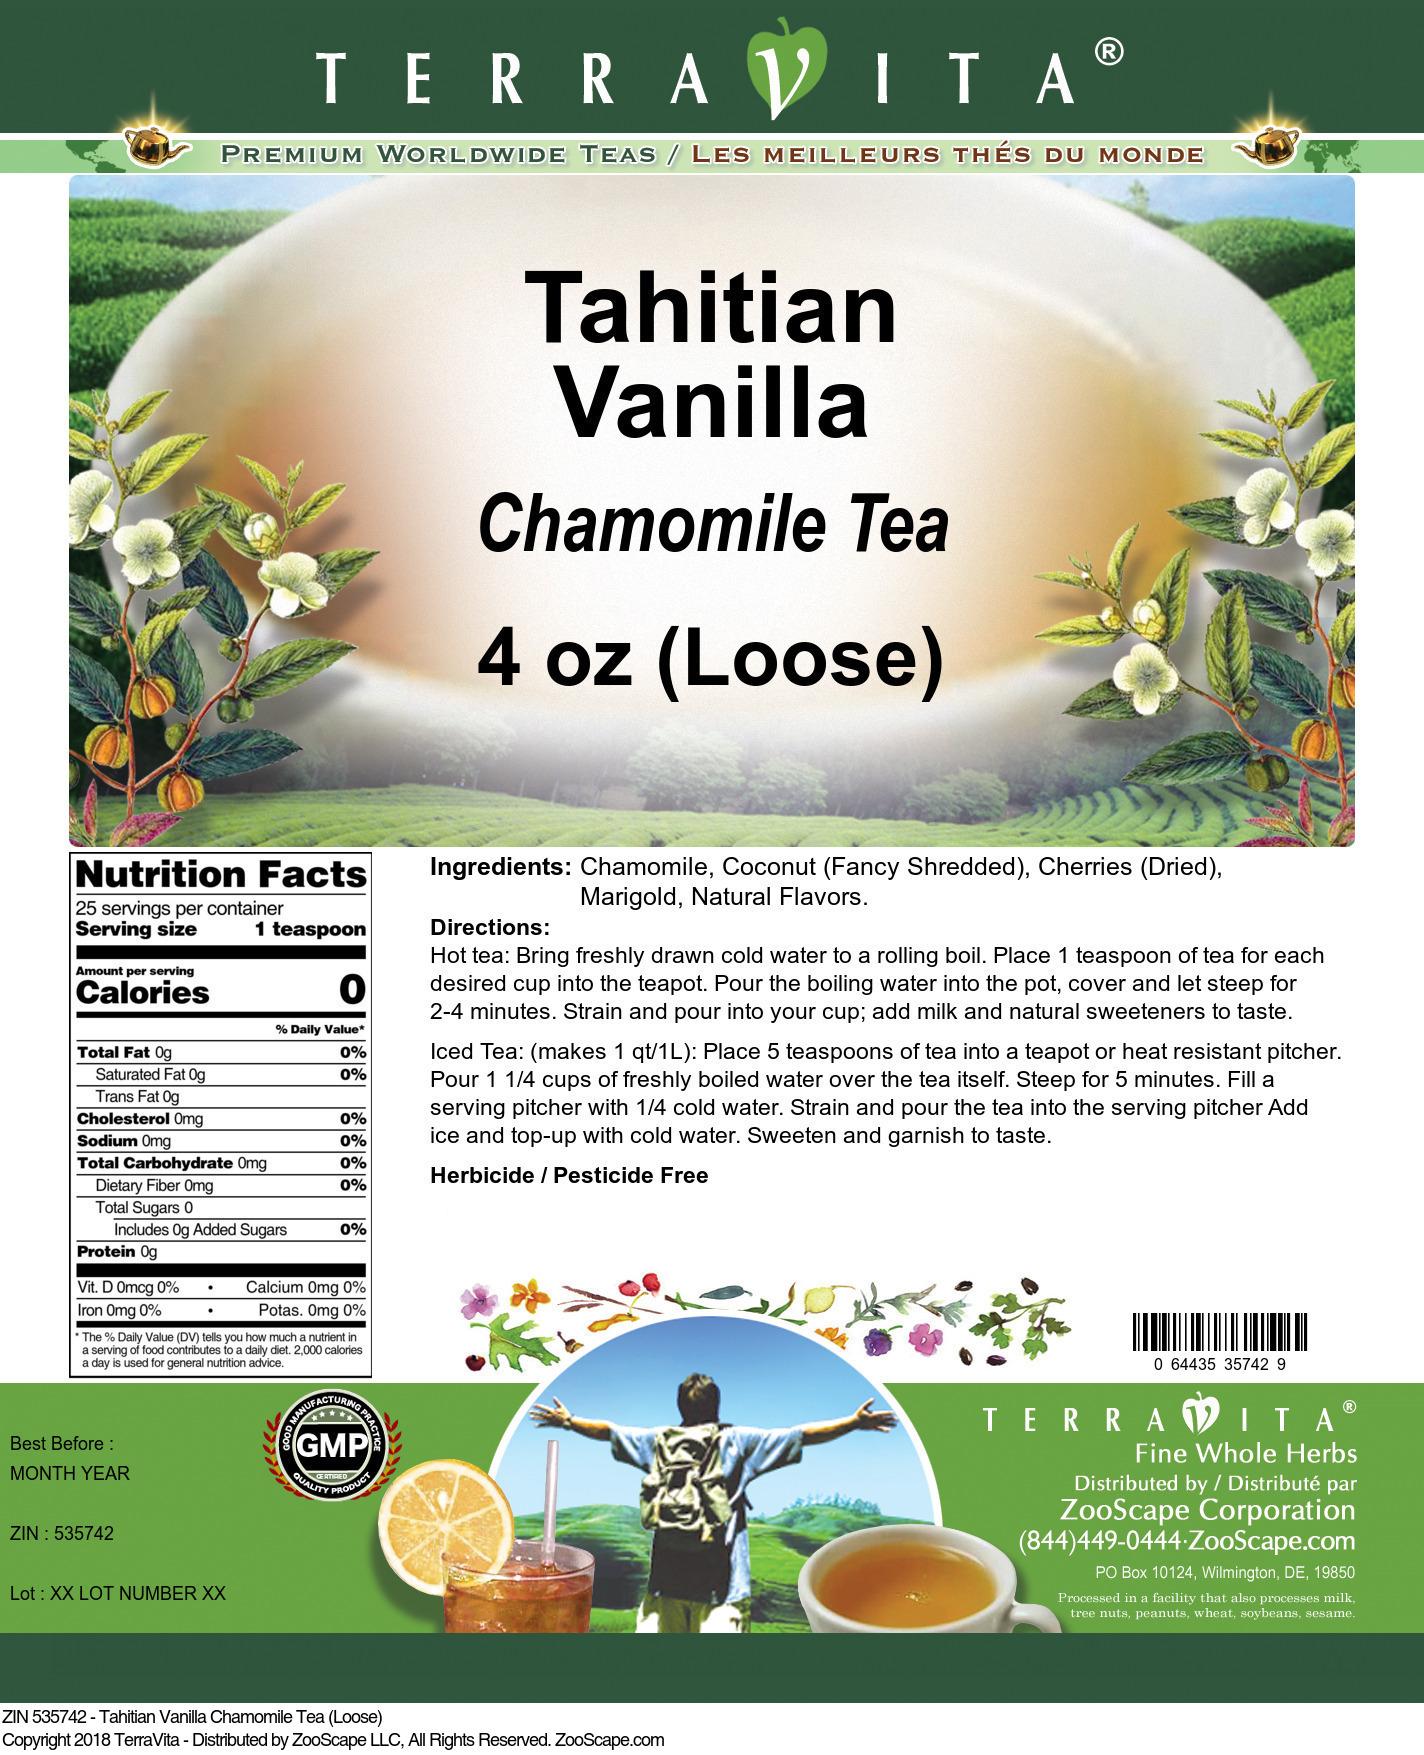 Tahitian Vanilla Chamomile Tea (Loose)